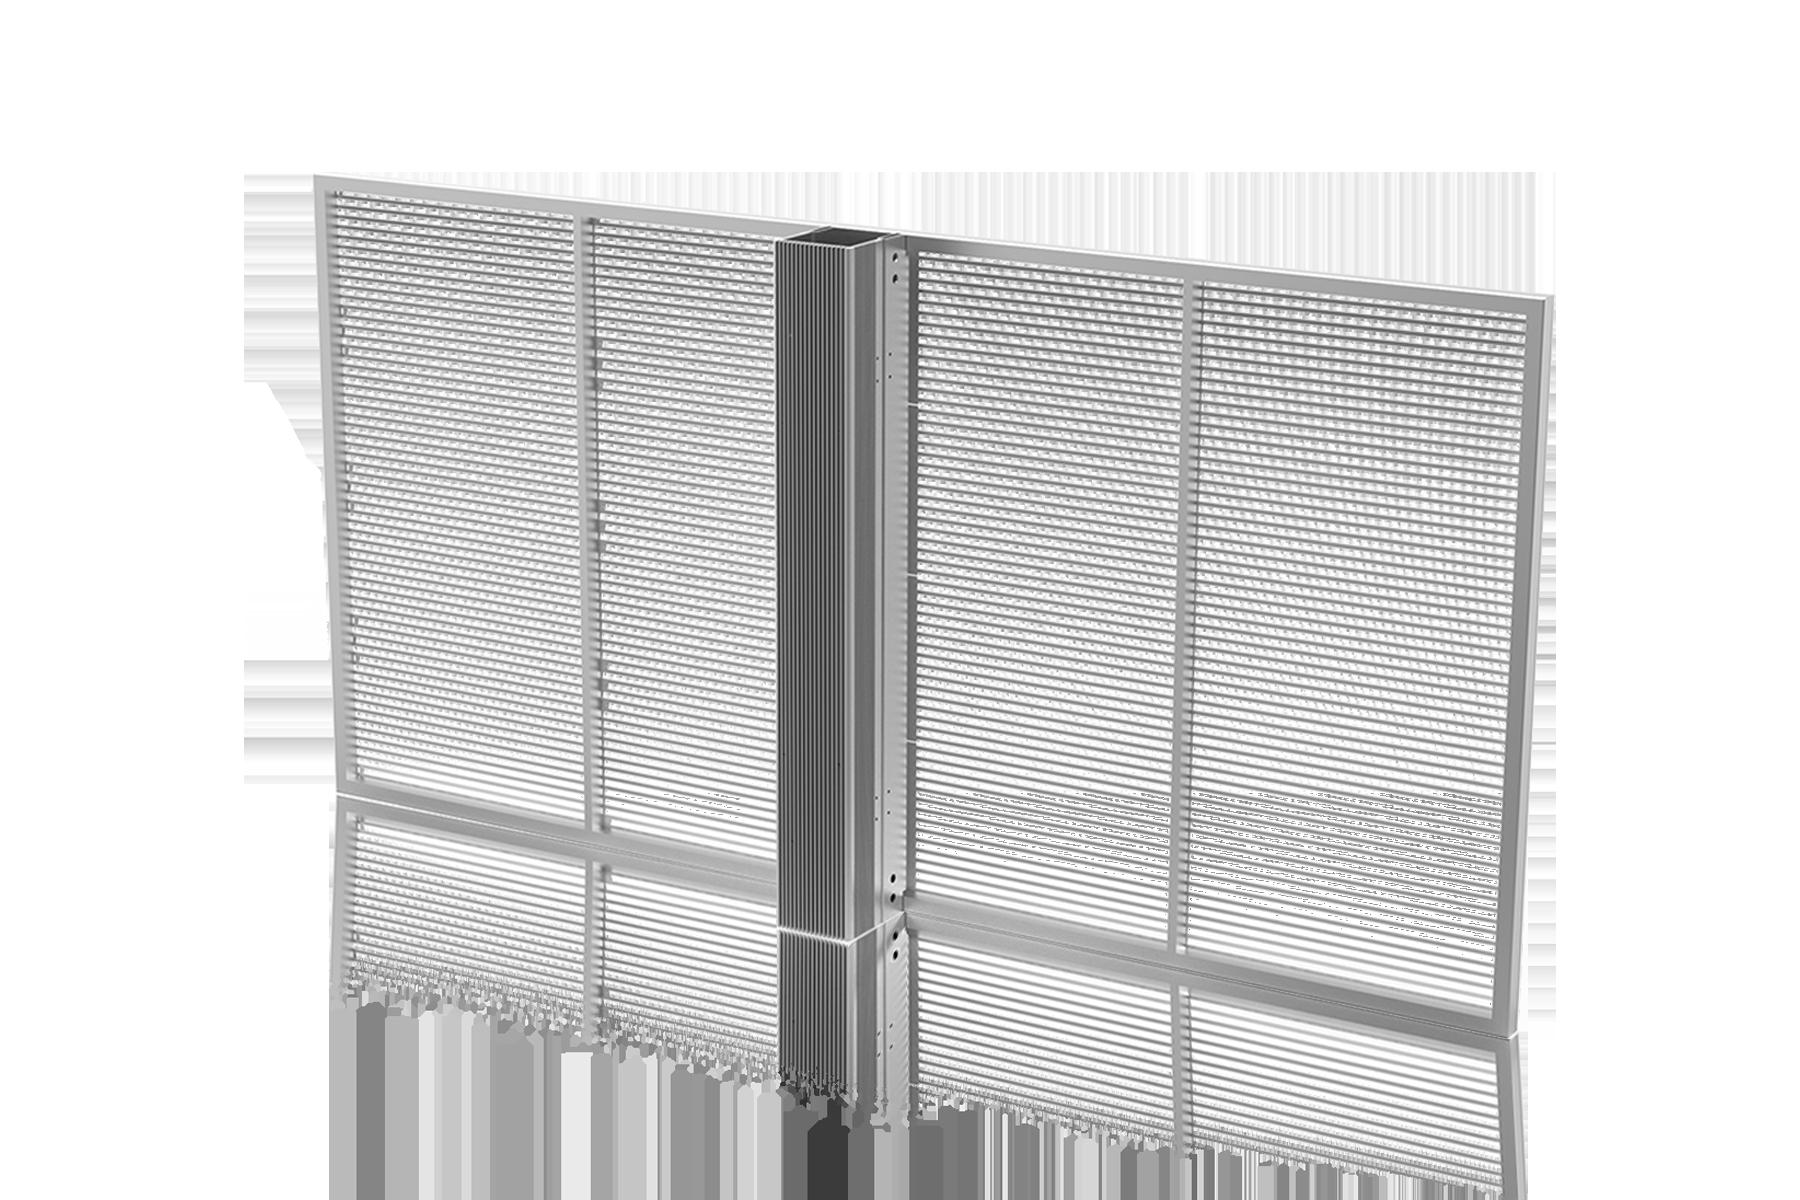 KT-R (Rigid) Transparent LED Display Series,MORE